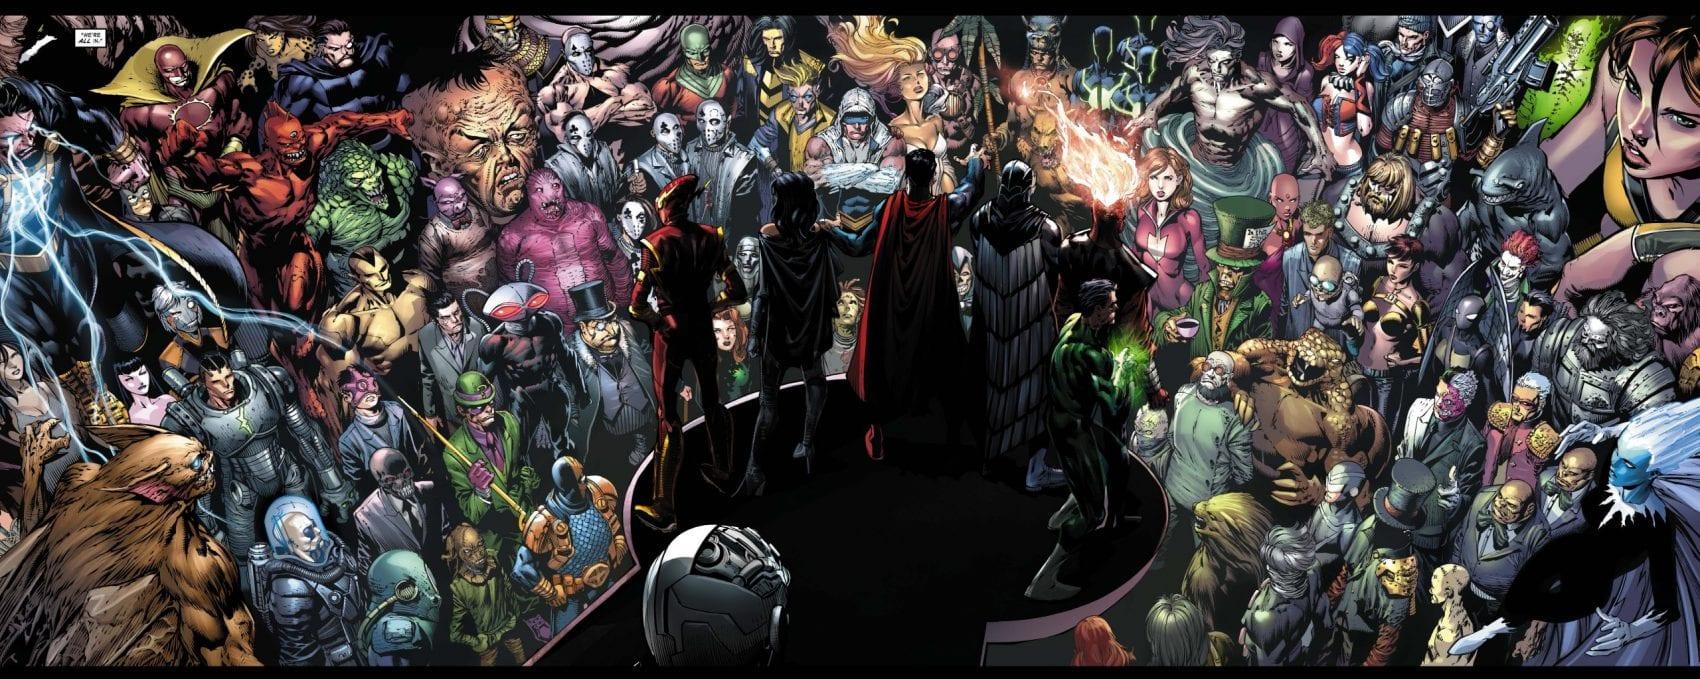 Top 10 Méchants DC Comics My Geek Actu 1